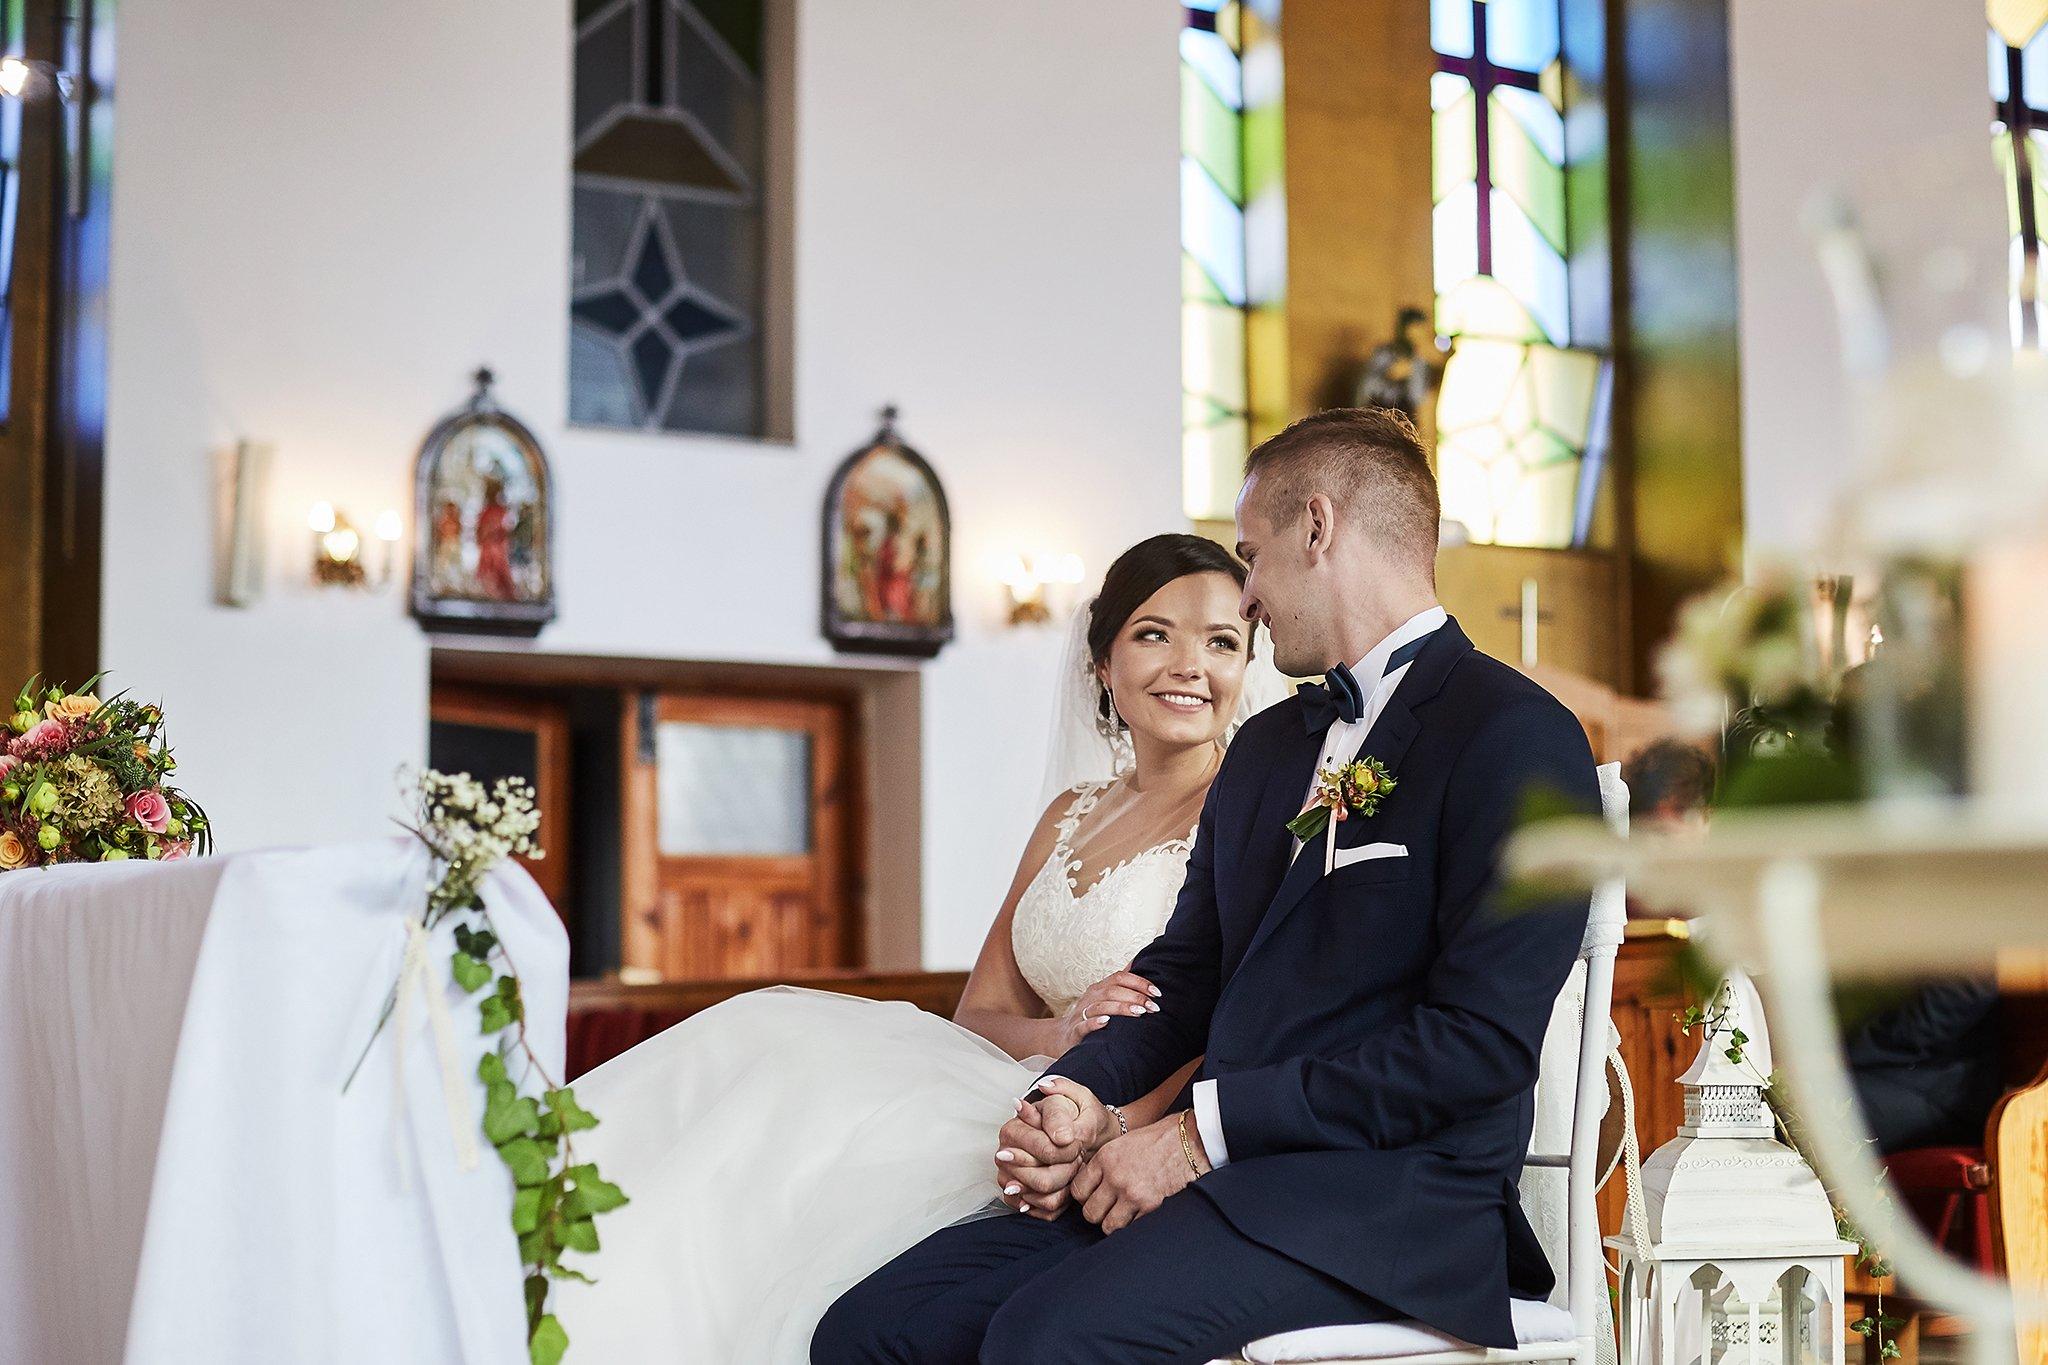 uśmiech, panna młoda, garnitur, suknia ślubna